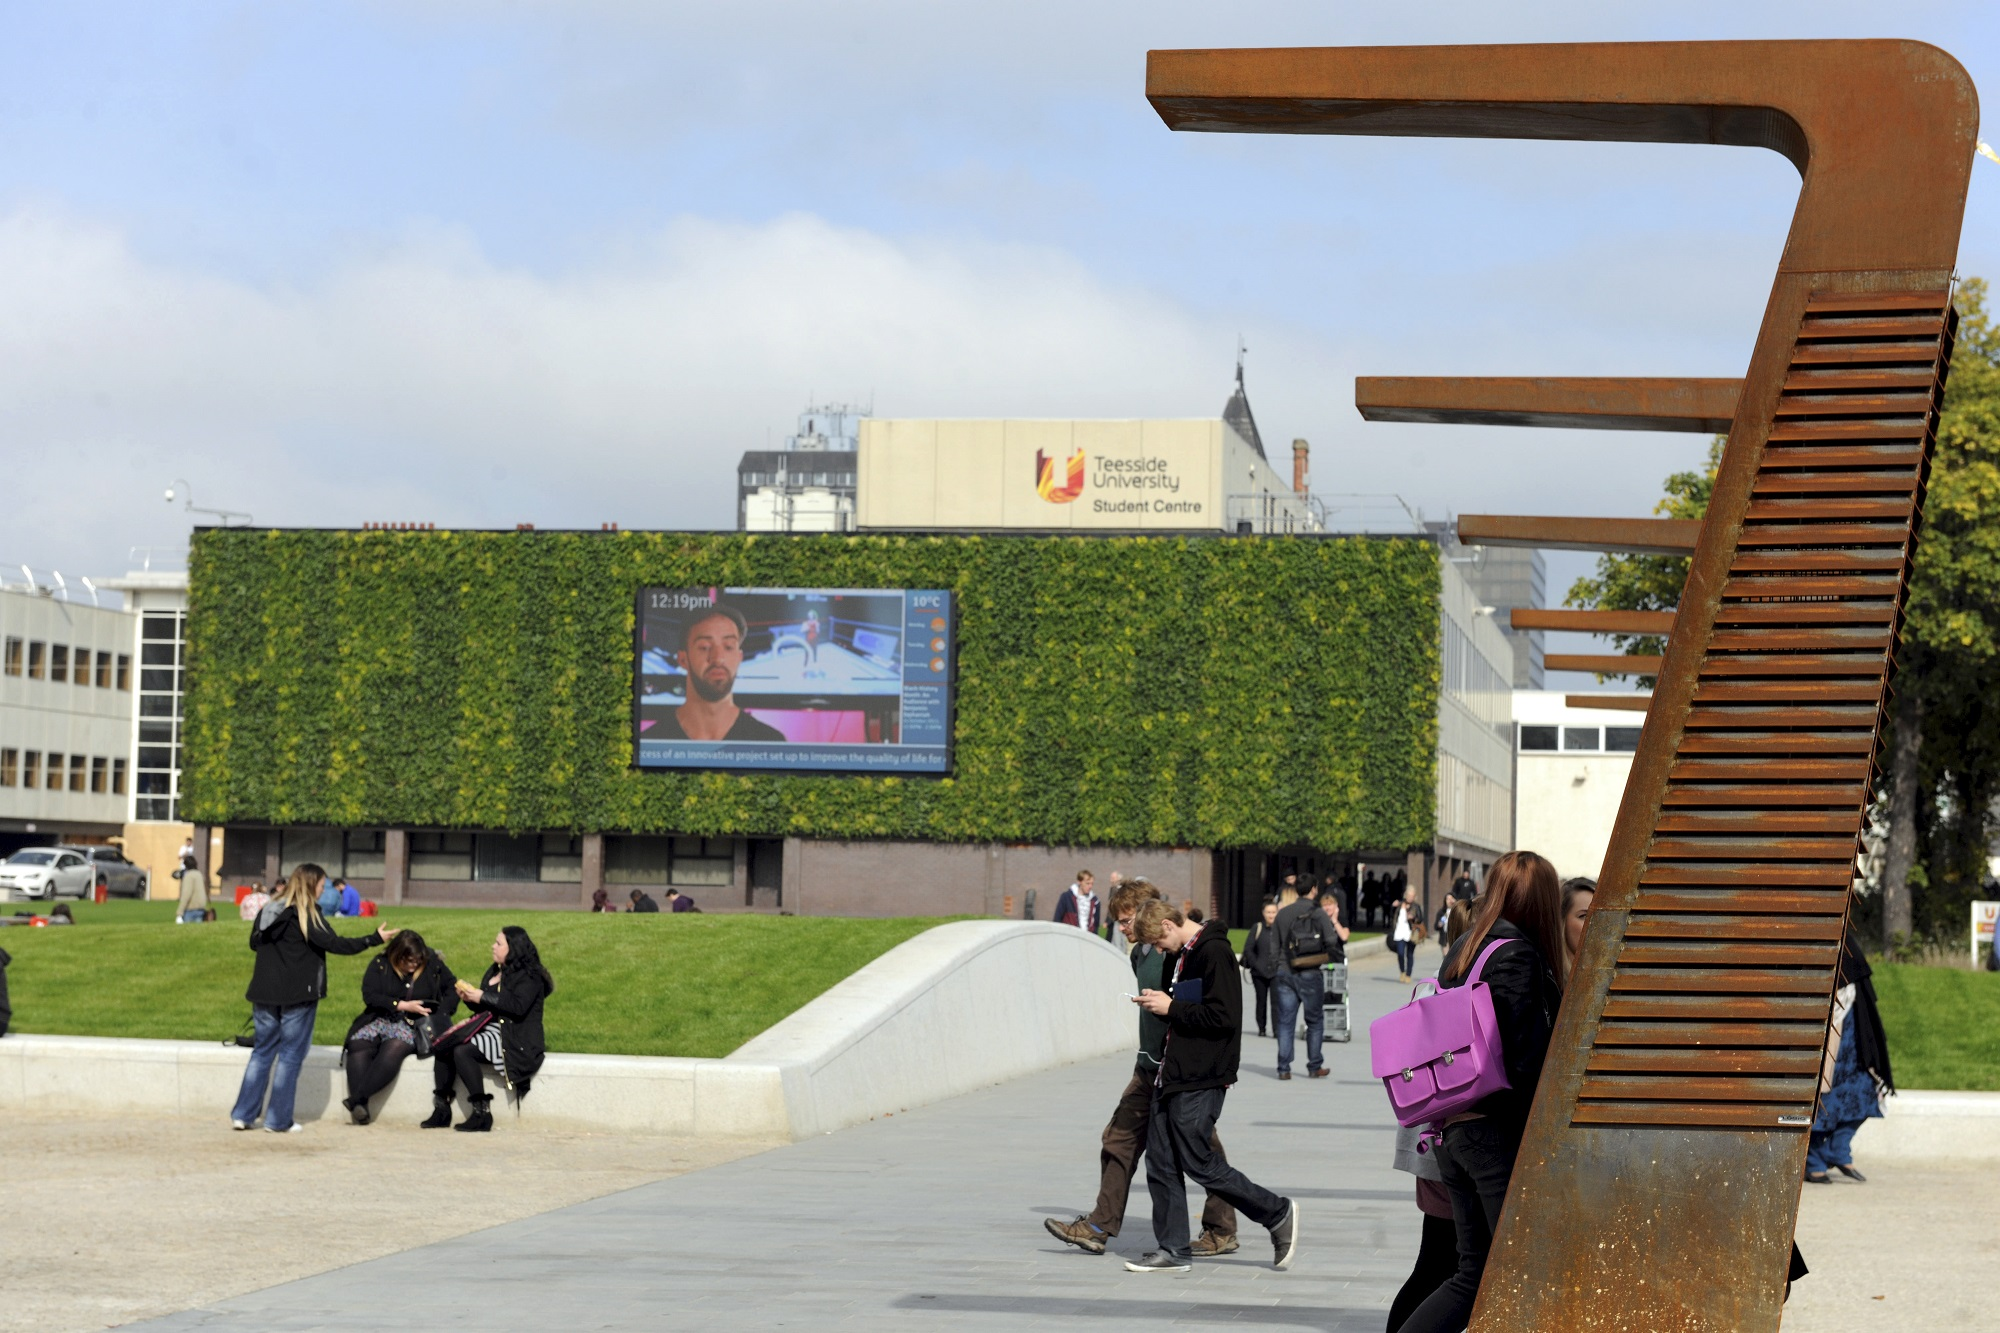 Vertical garden installation brings university to 'life'